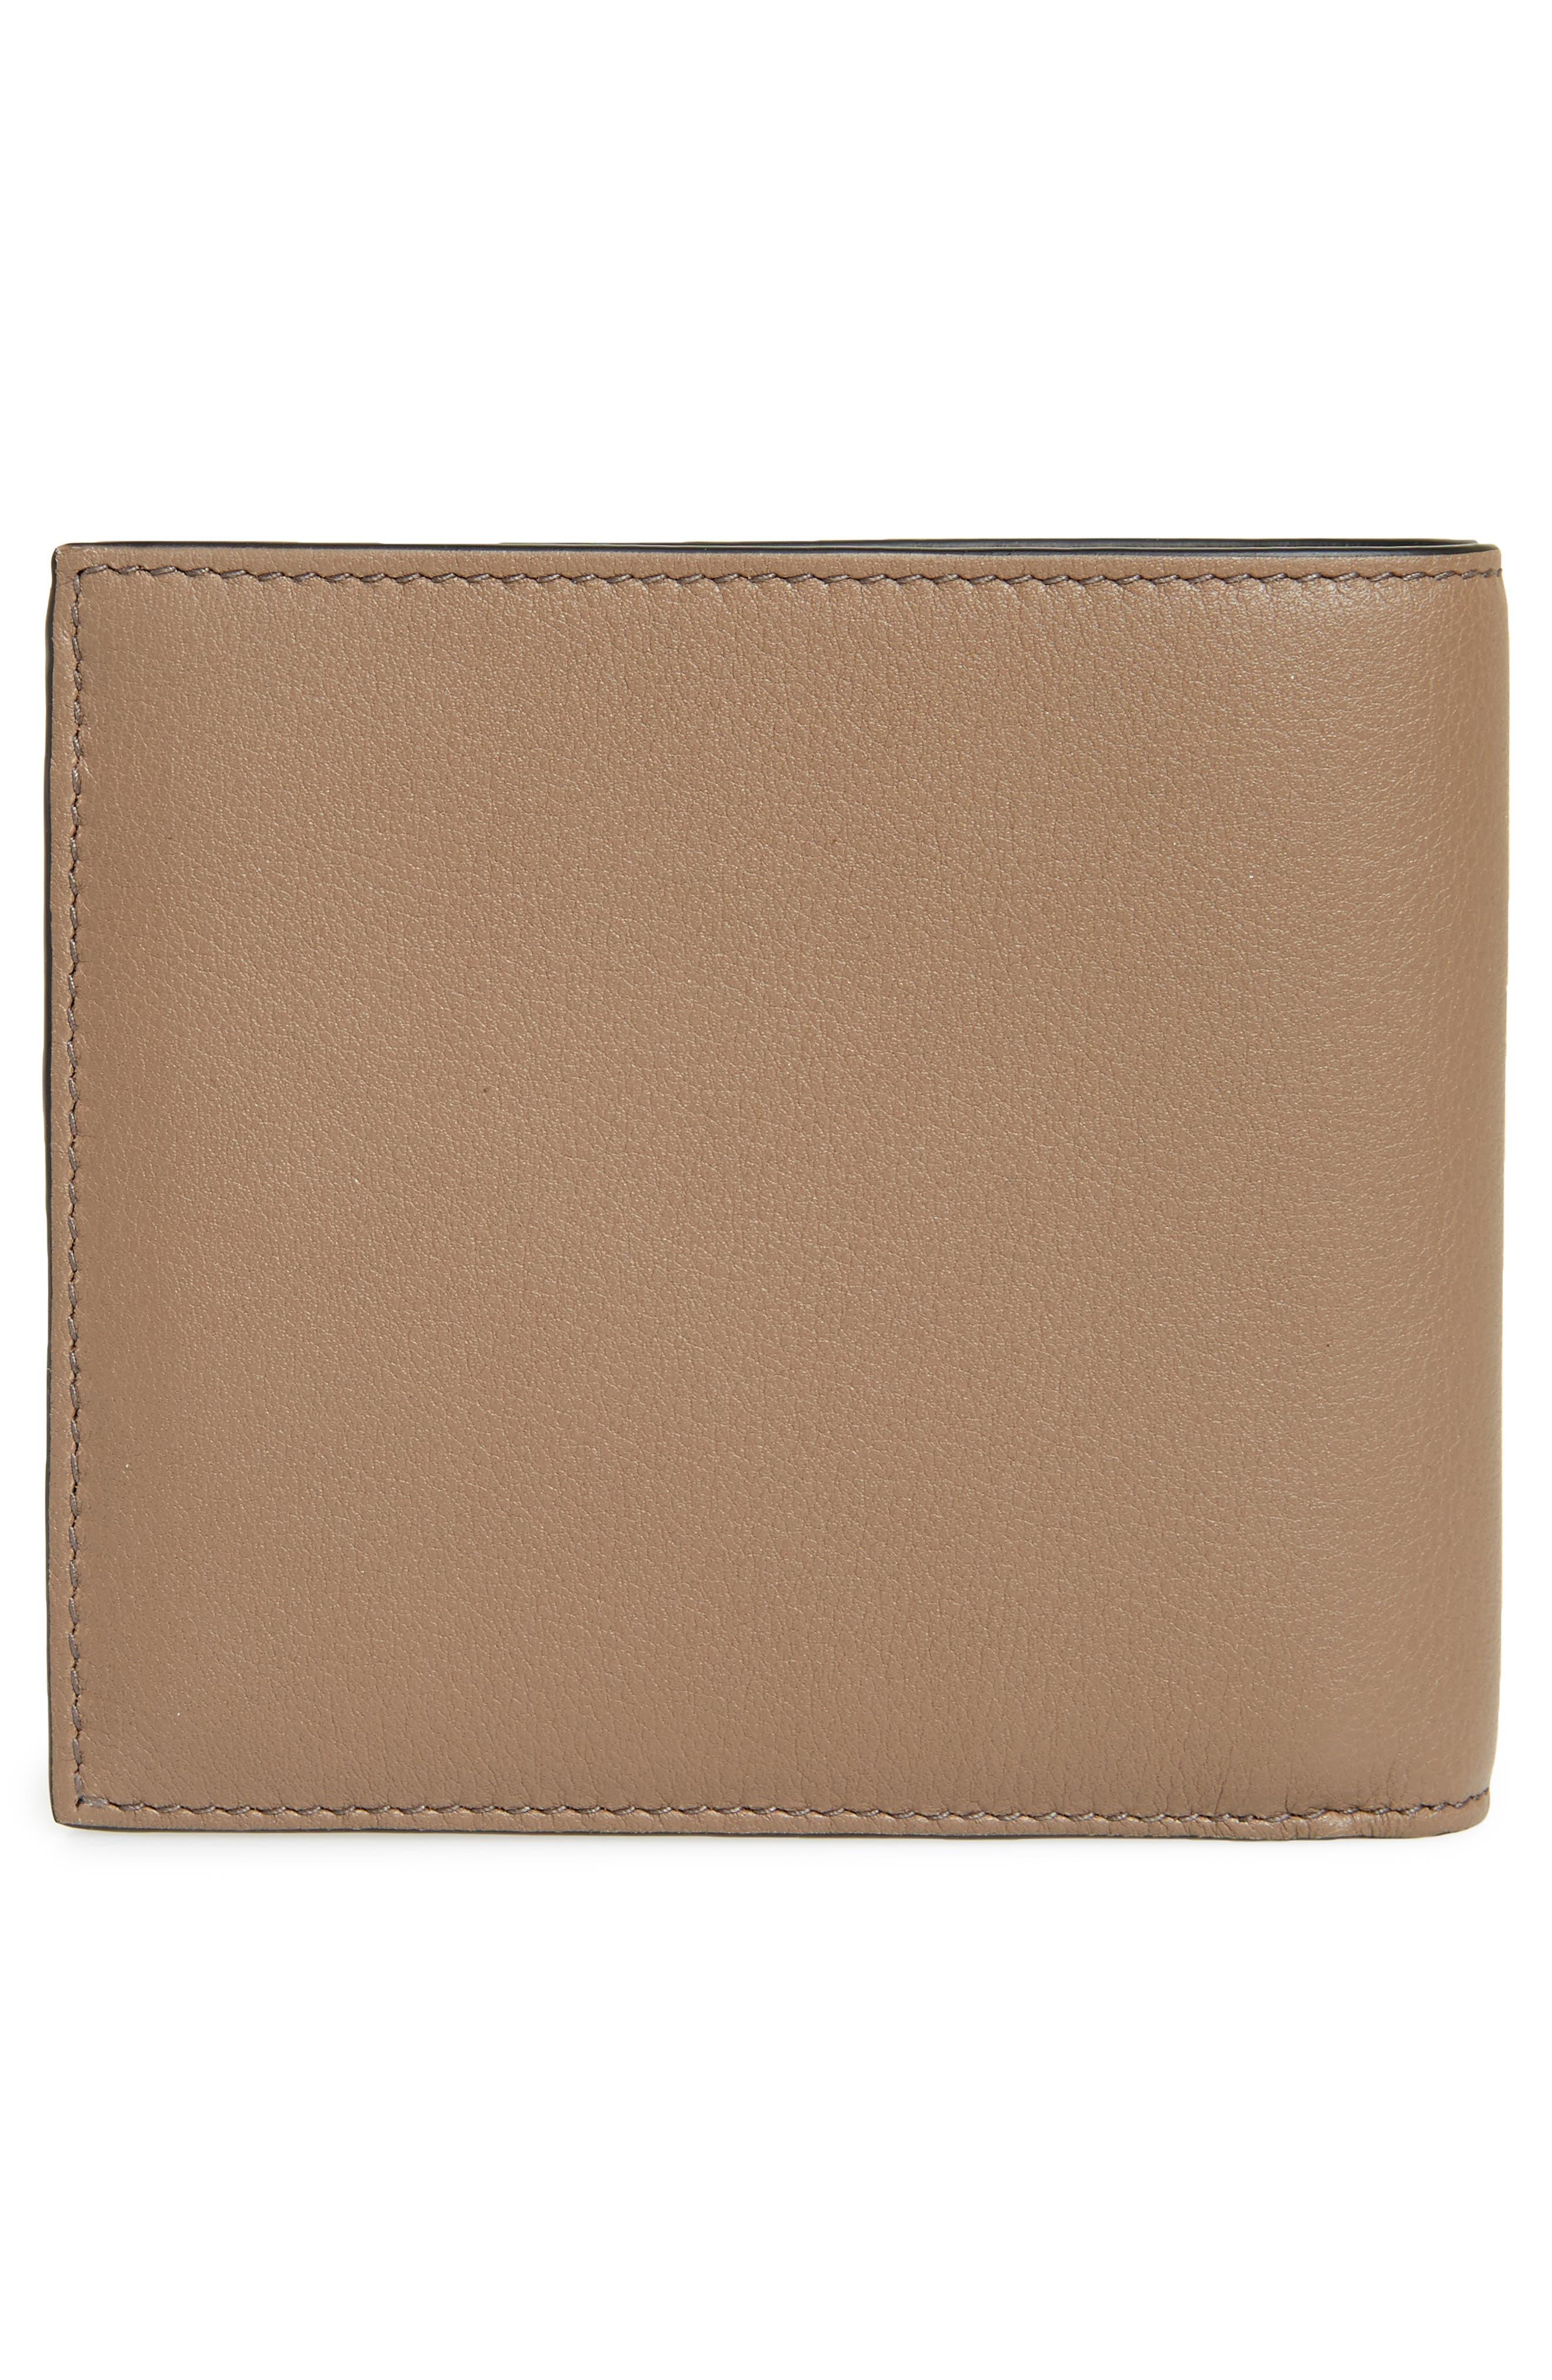 Skull Leather Bifold Wallet,                             Alternate thumbnail 3, color,                             922